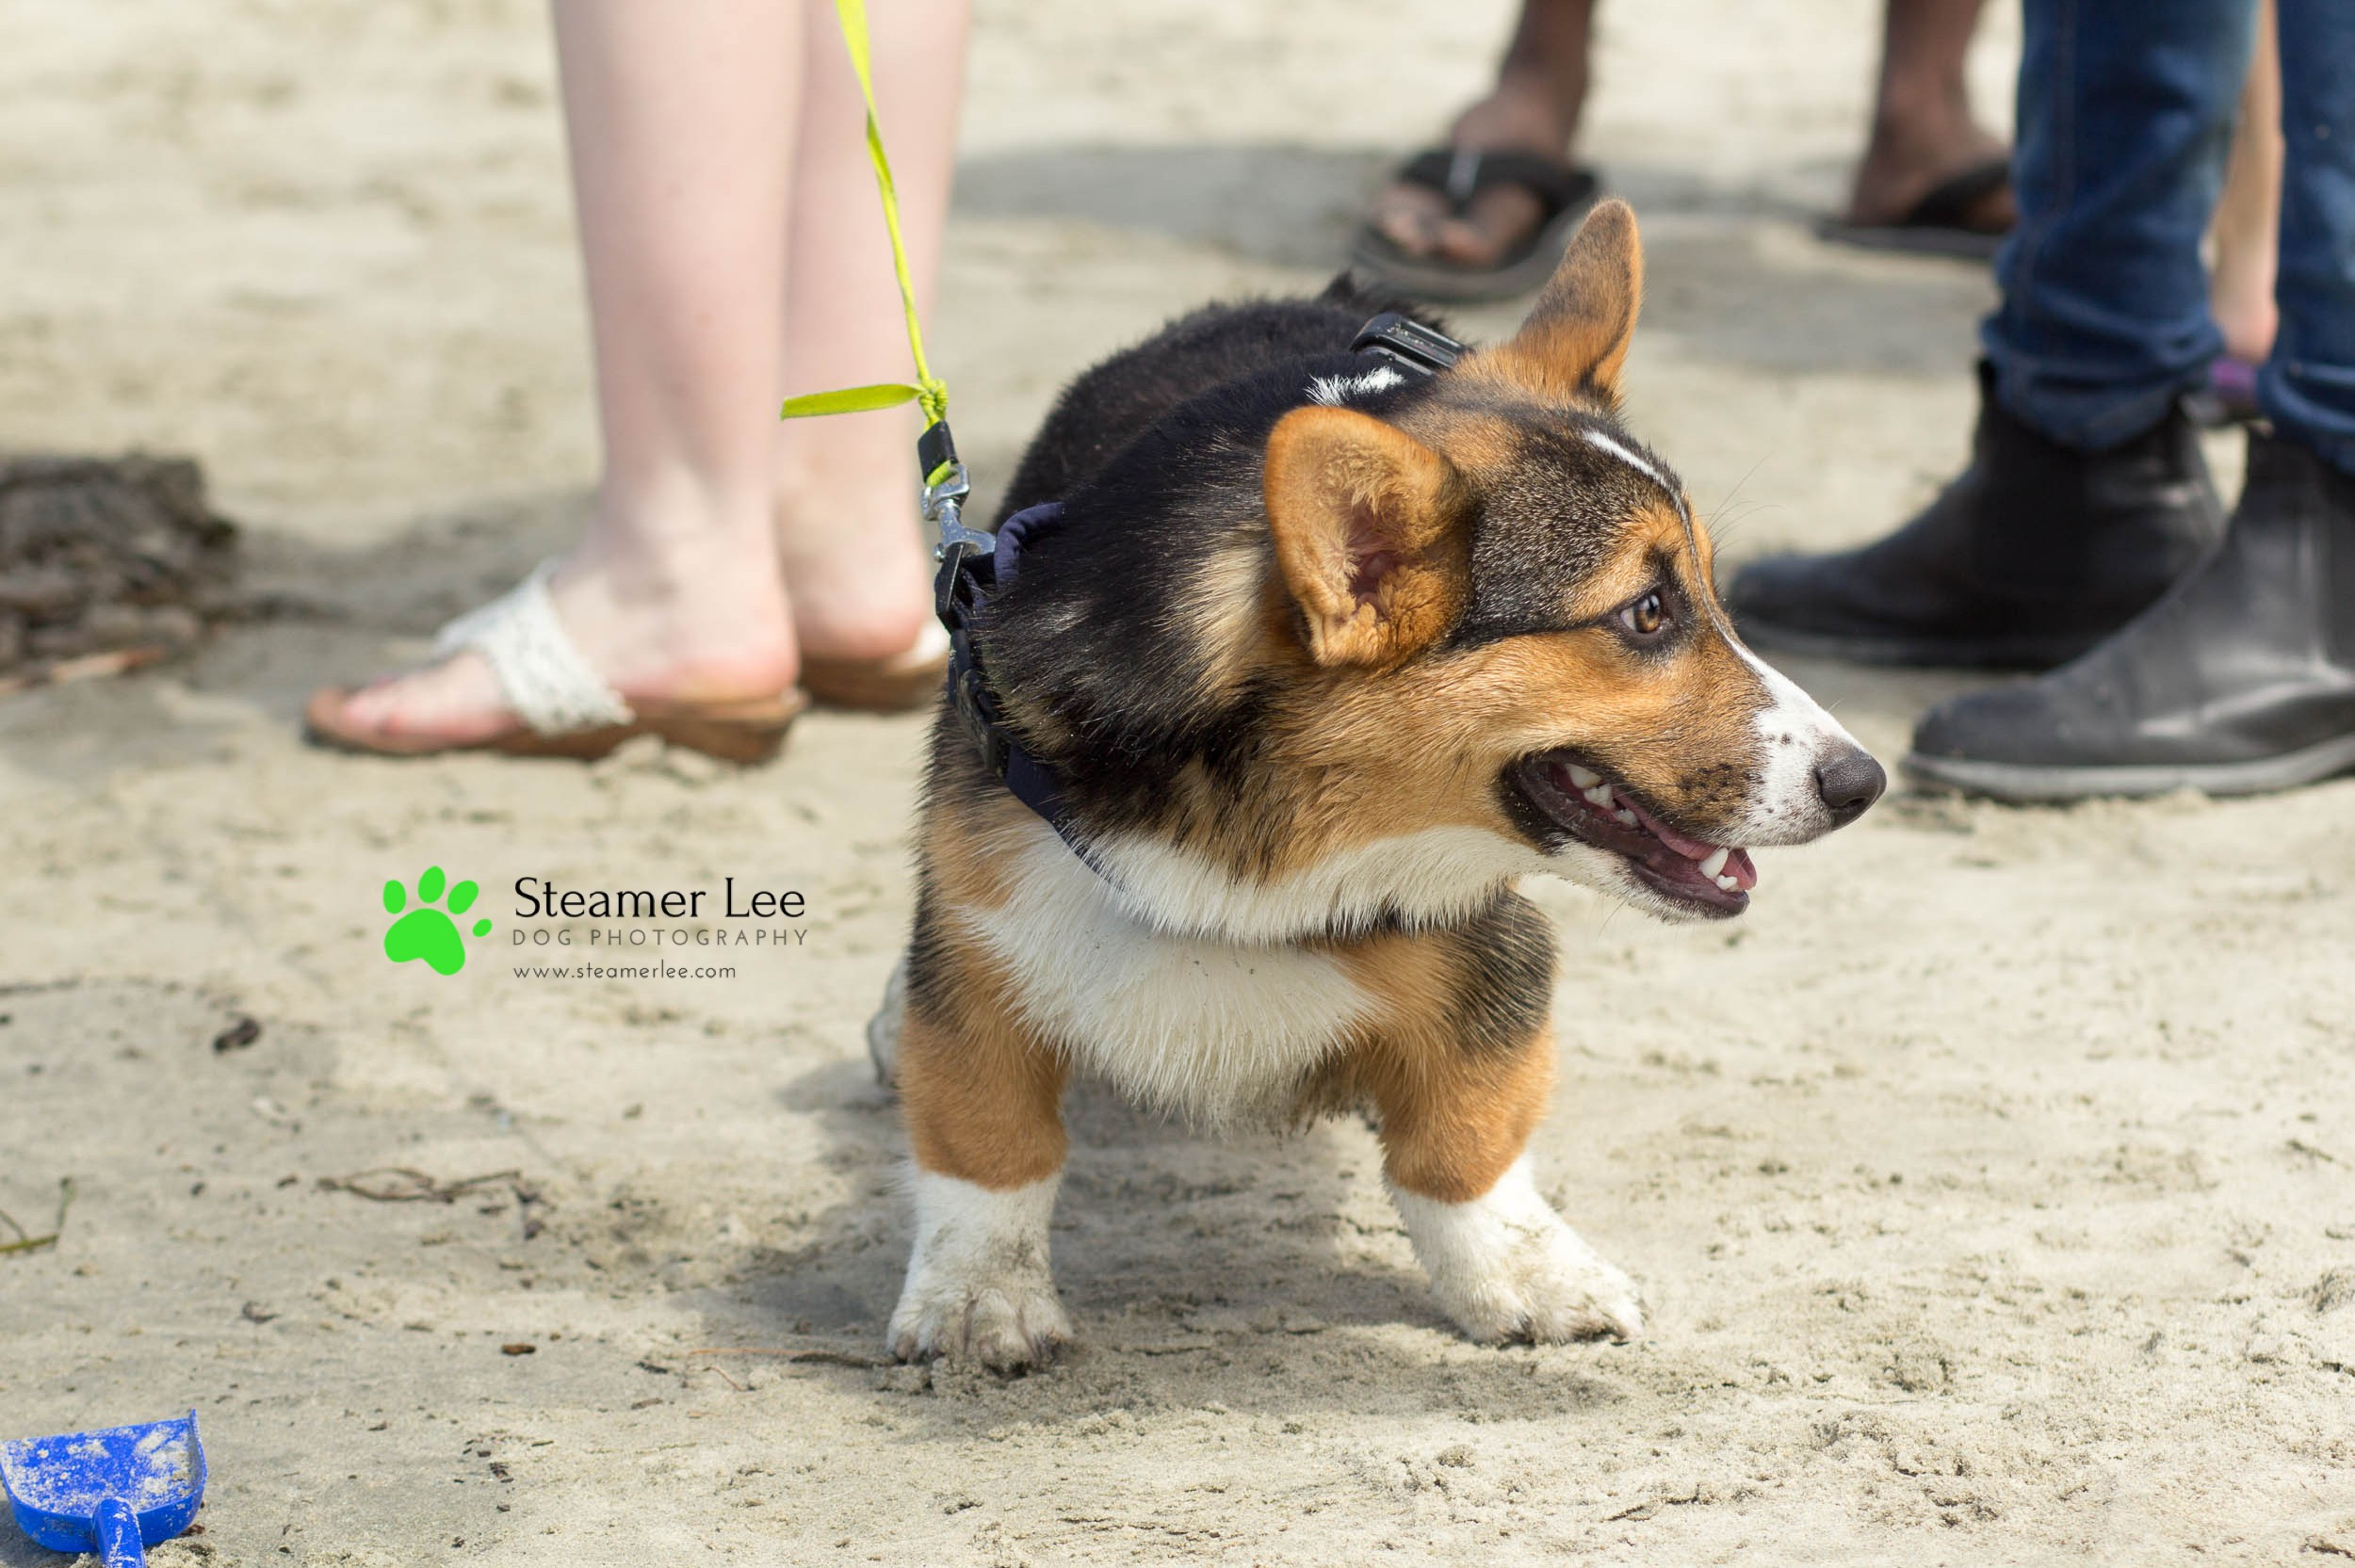 Steamer Lee Dog Photography - July 2017 So Cal Corgi Beach Day - Vol. 3 - 14.jpg